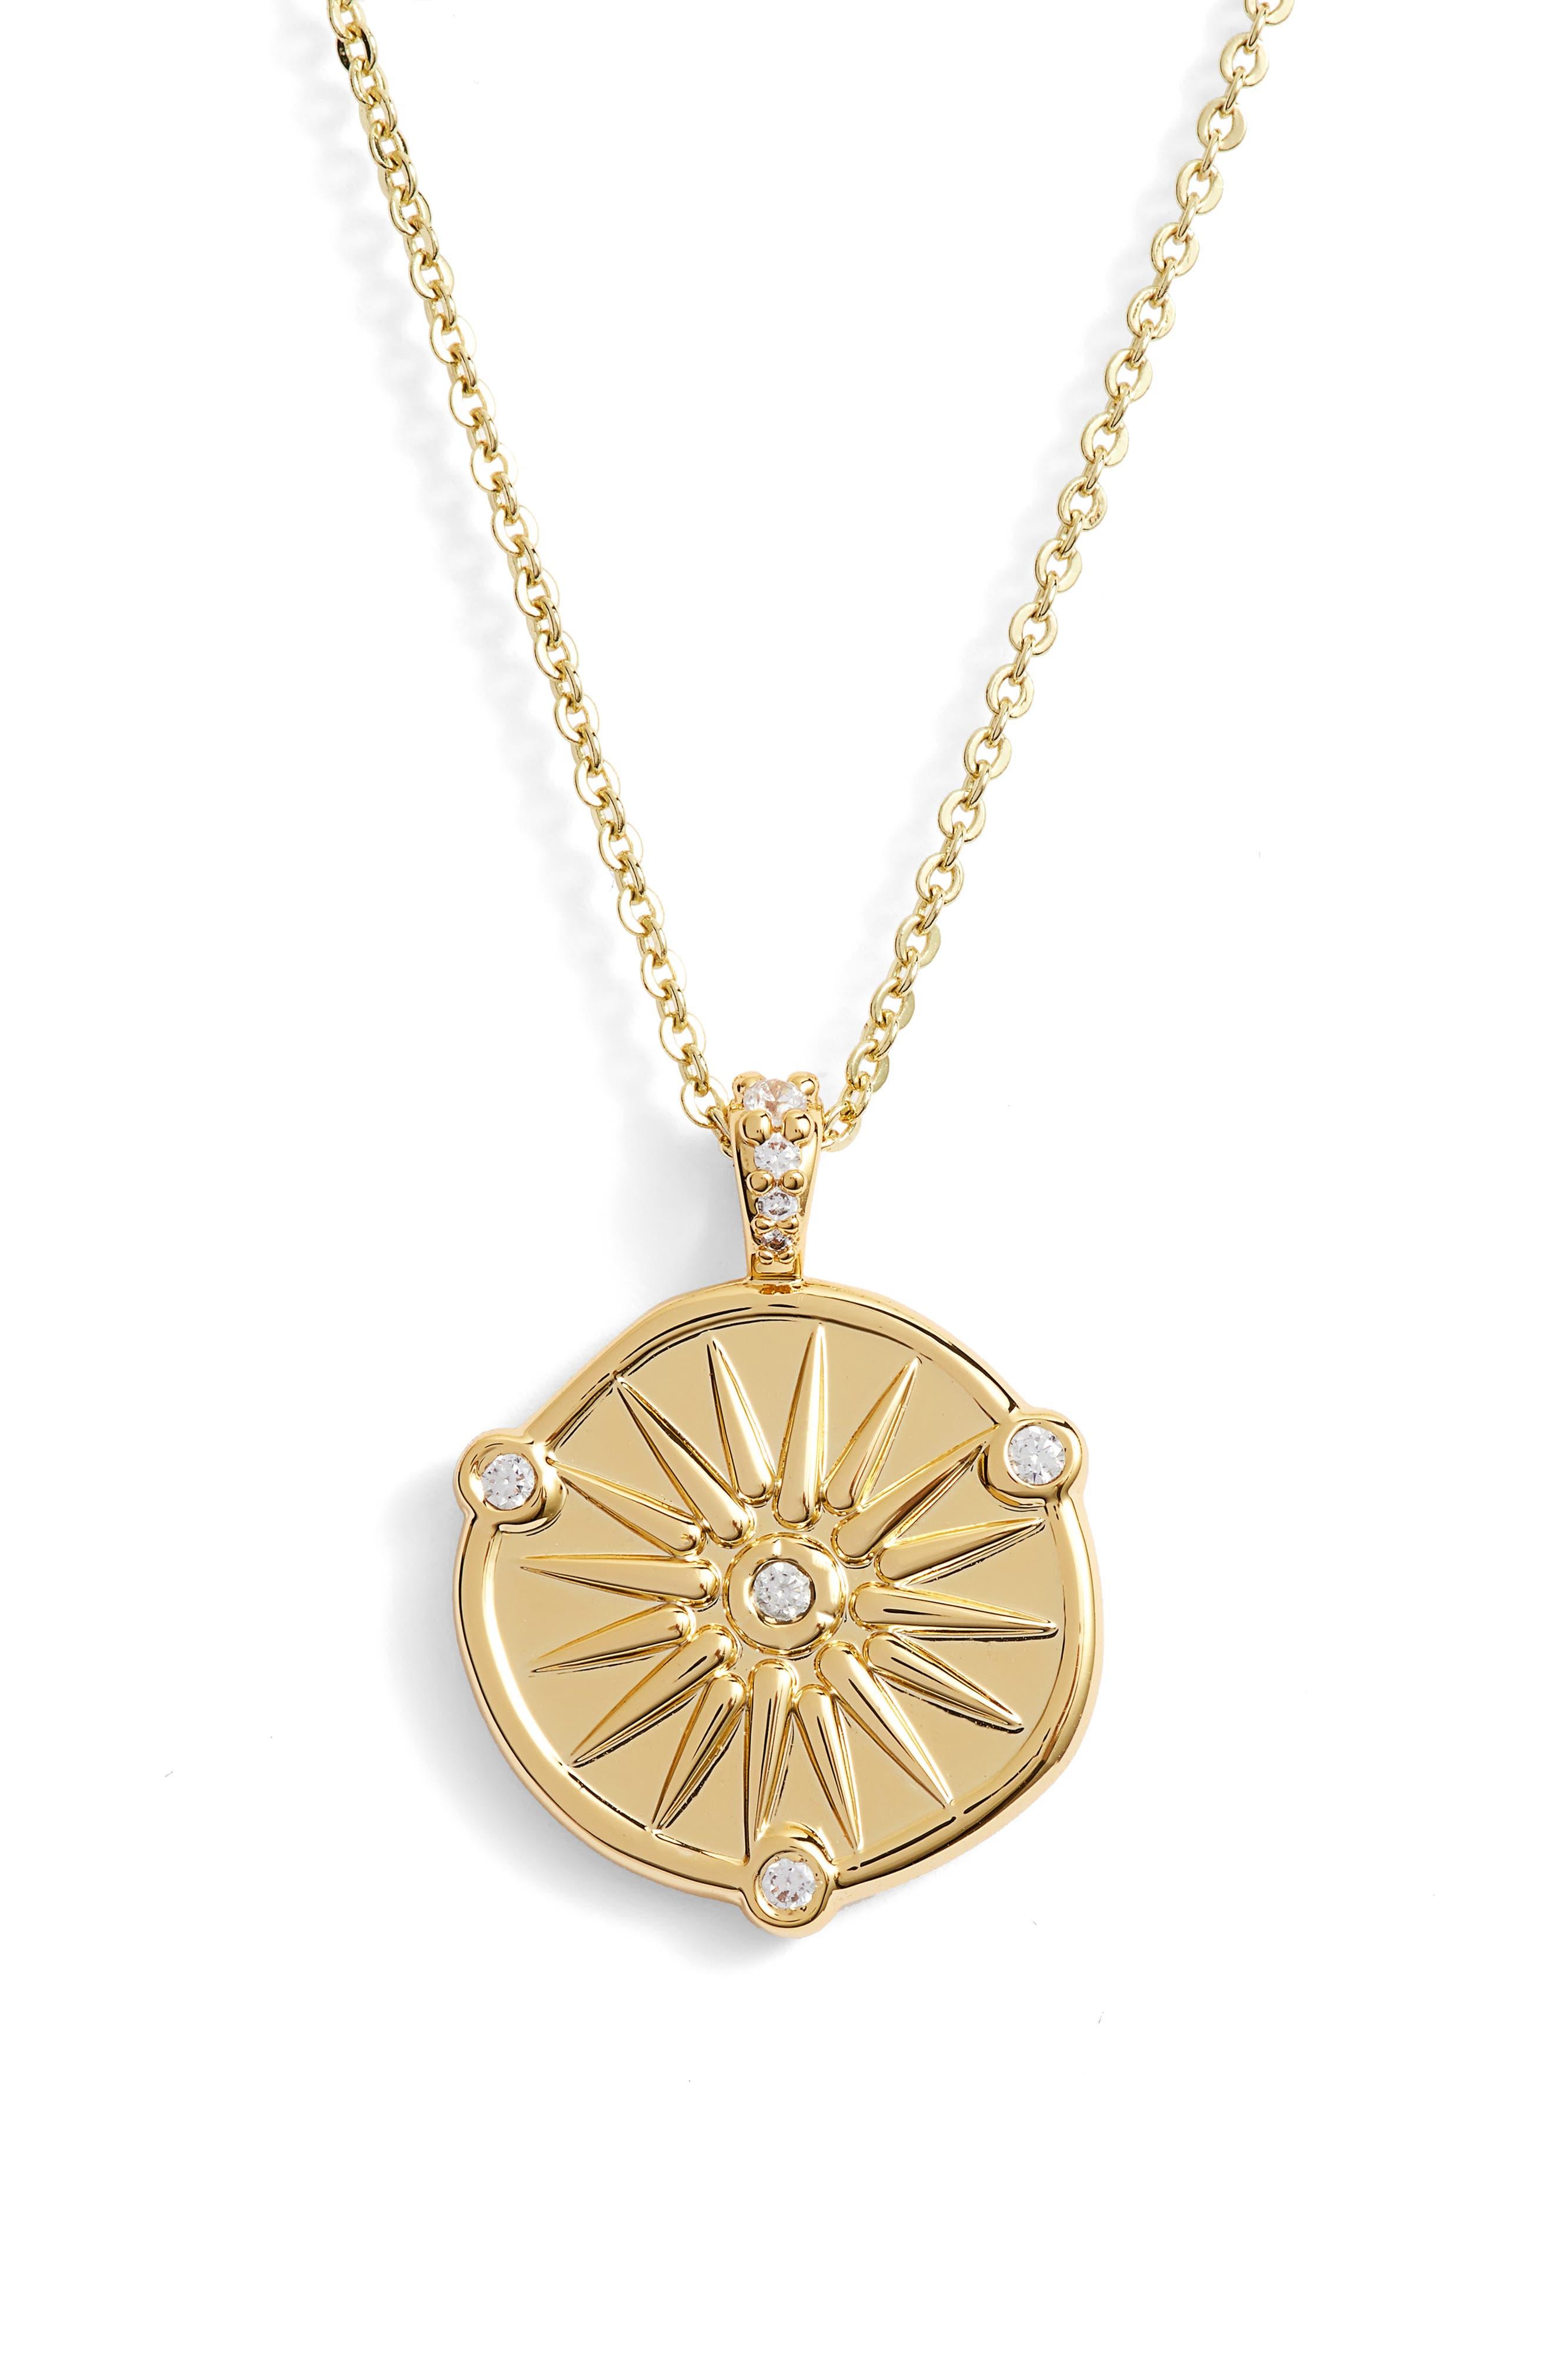 LULU DK Aphrodite Necklace in Gold